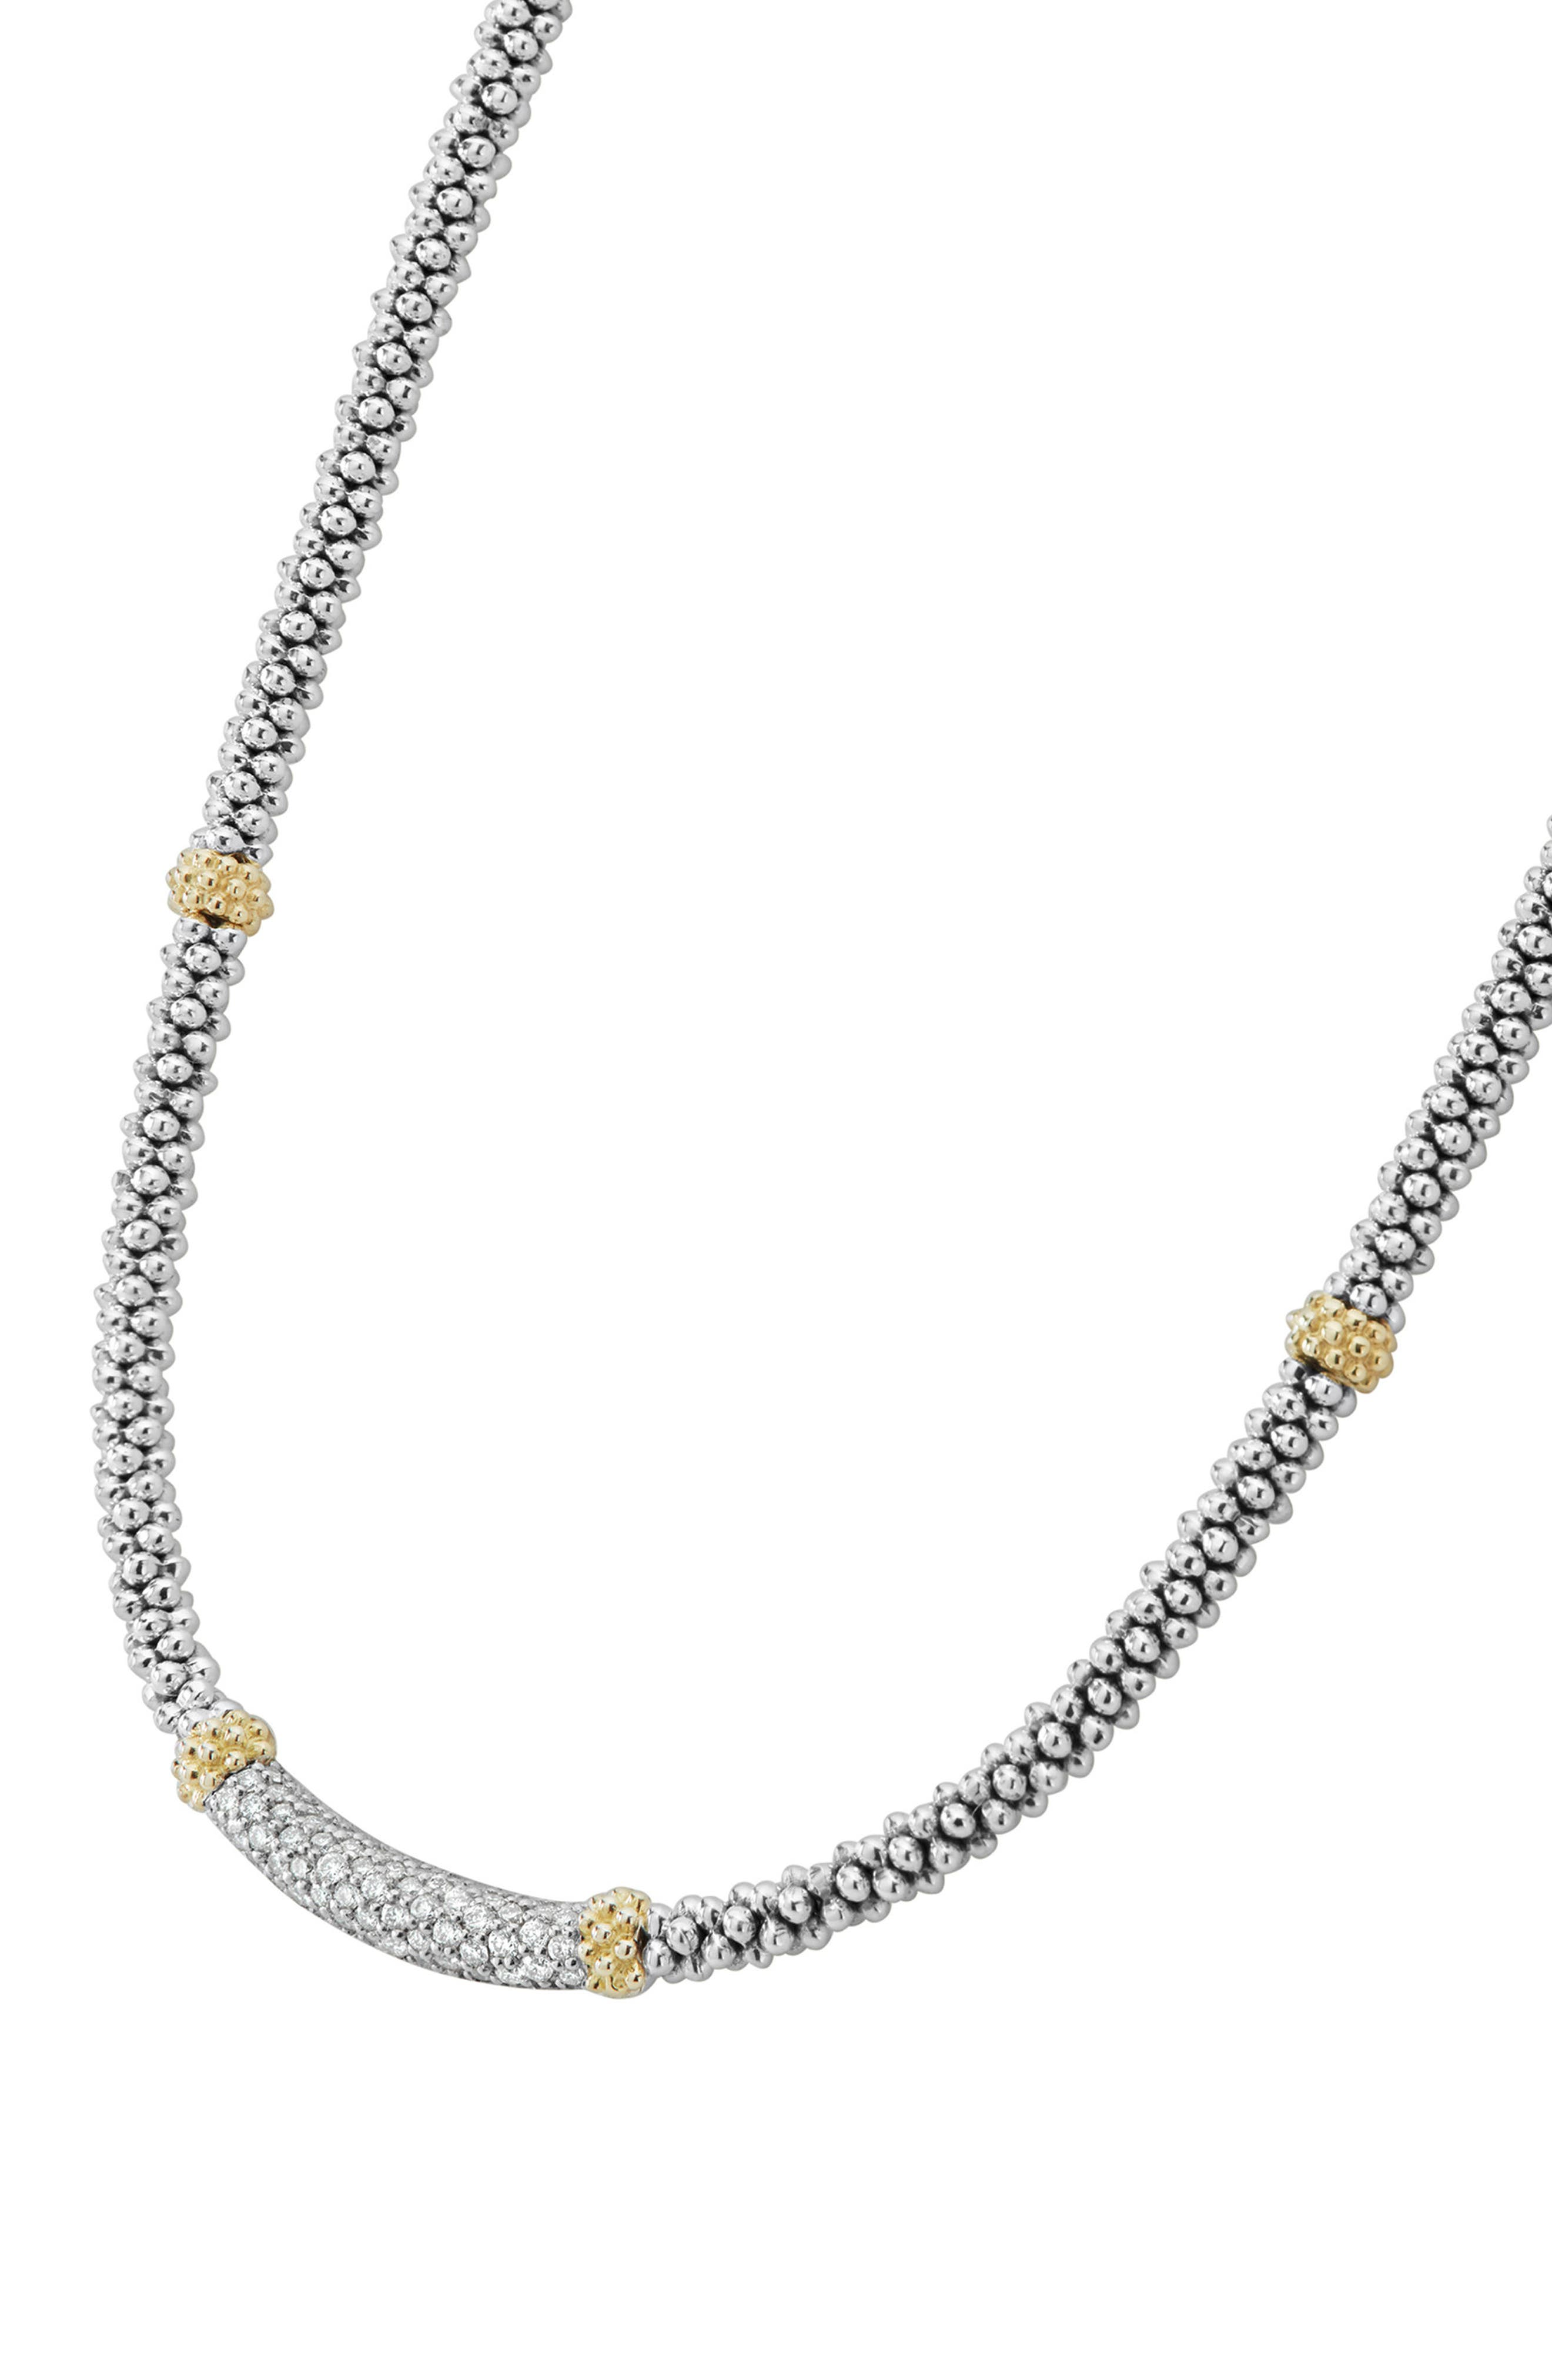 Lux Diamond Rope Necklace,                             Alternate thumbnail 4, color,                             SILVER/ DIAMOND